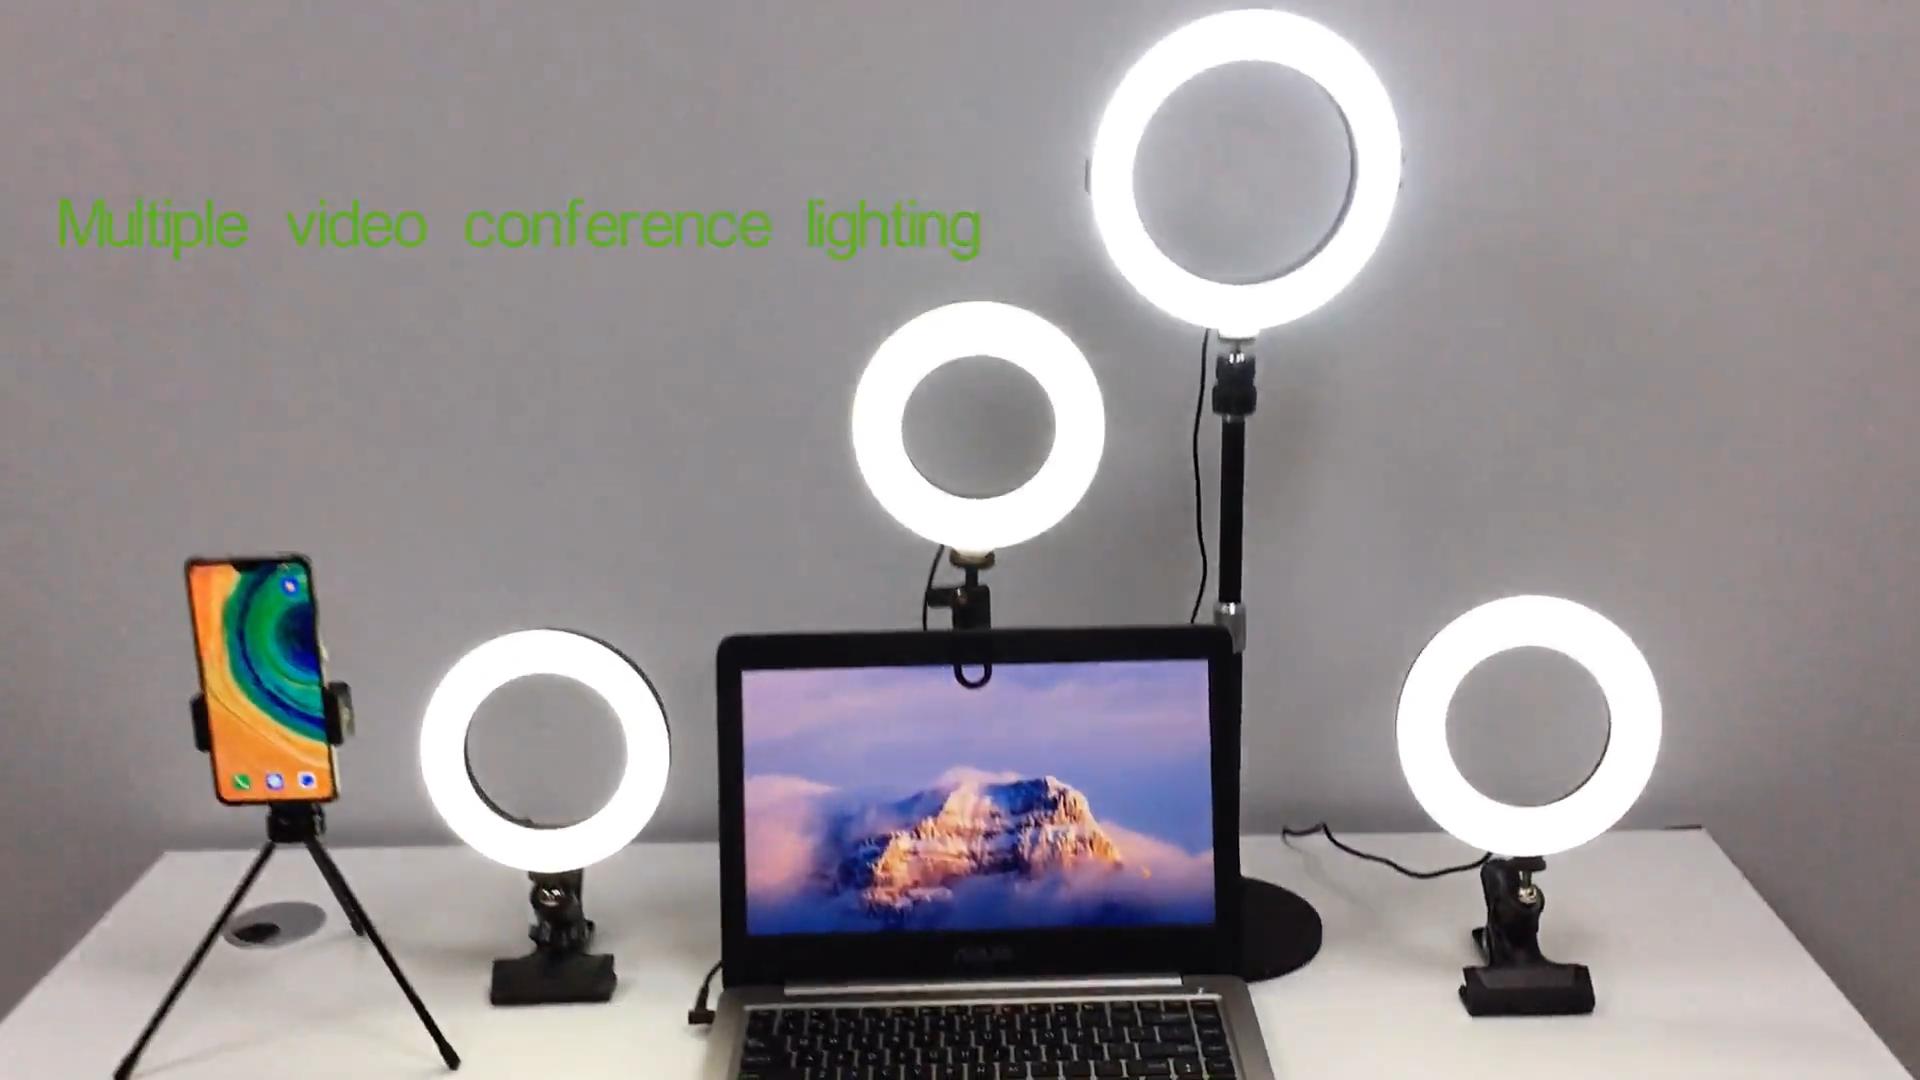 6 8 10 Inch Tiktok Usb Photo Studio Camera Selfie Fill Video Conference Lighting Kit Zoom Led Ring Light With Tripod Stand